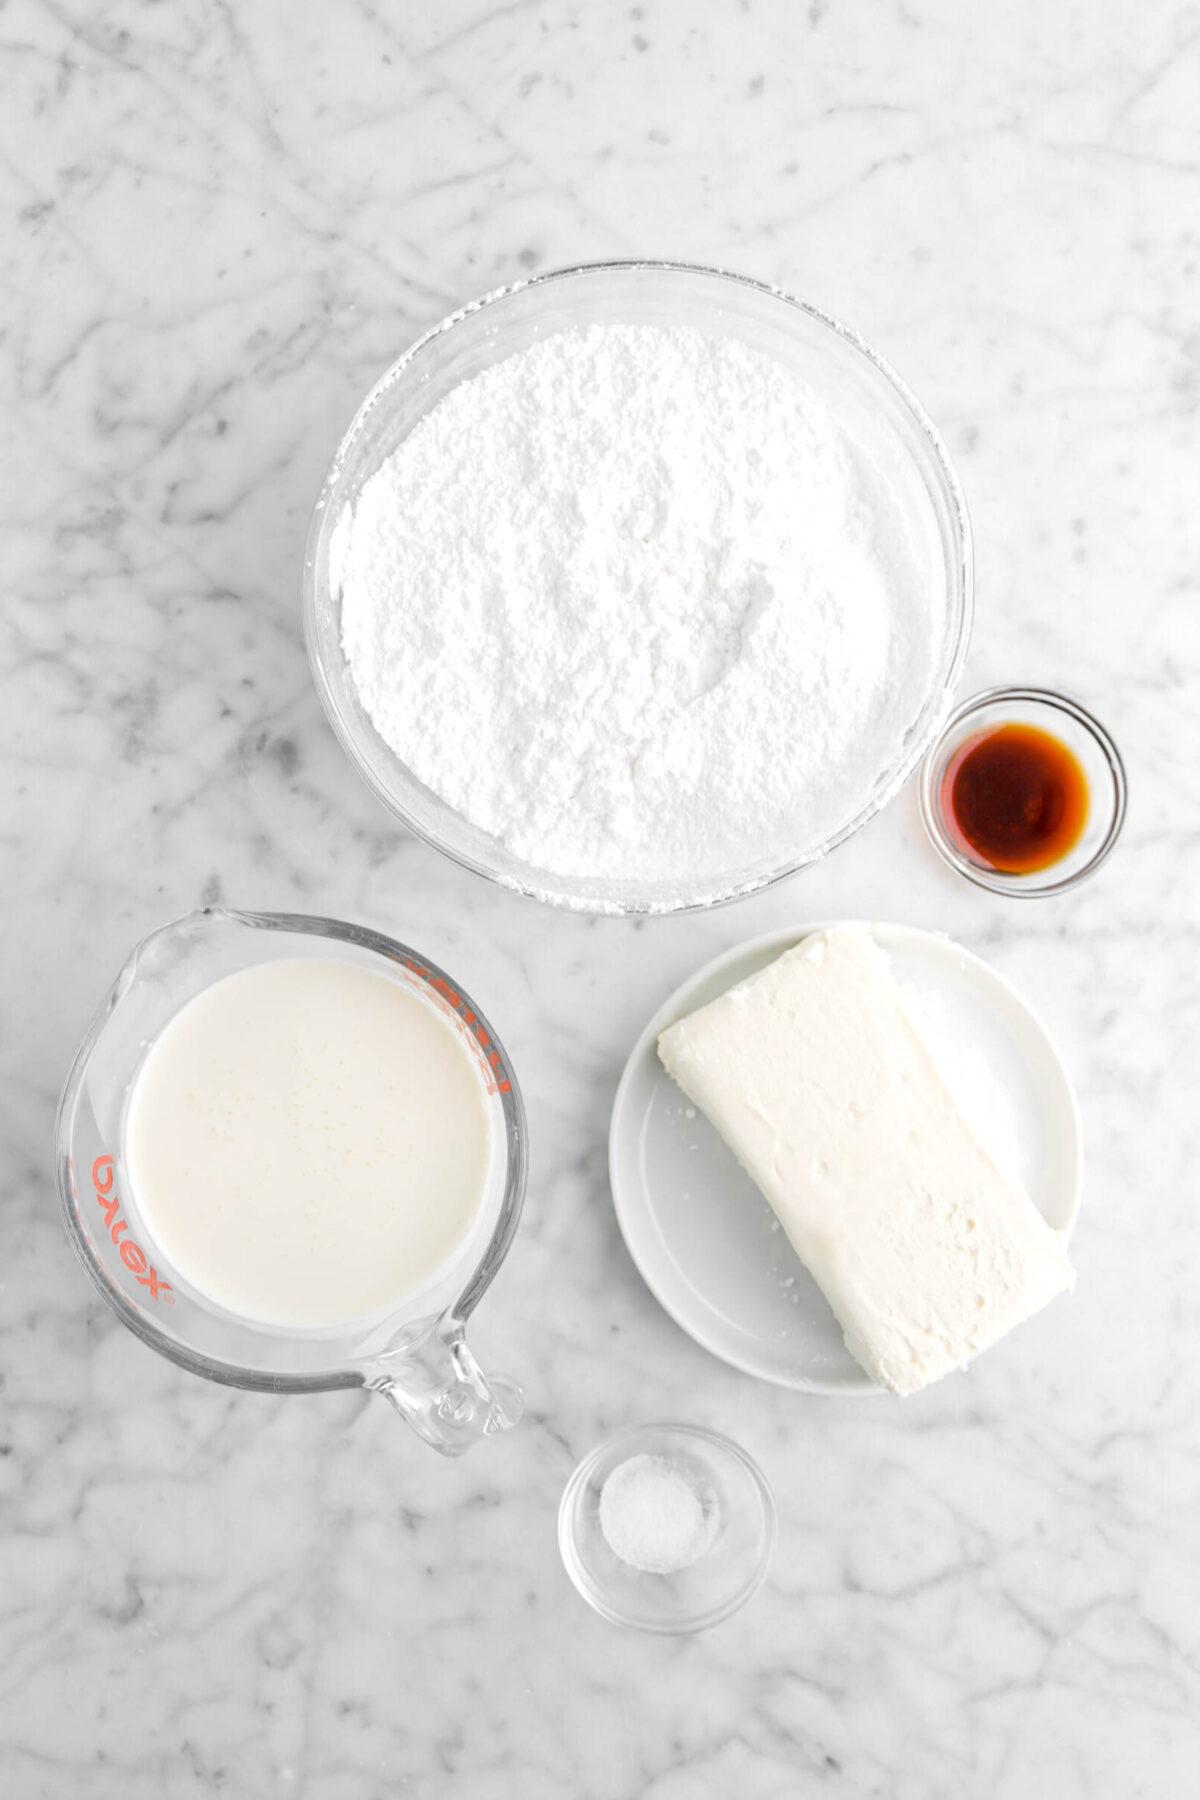 powdered sugar, vanilla, cream cheese, heavy cream, and salt on marble counter